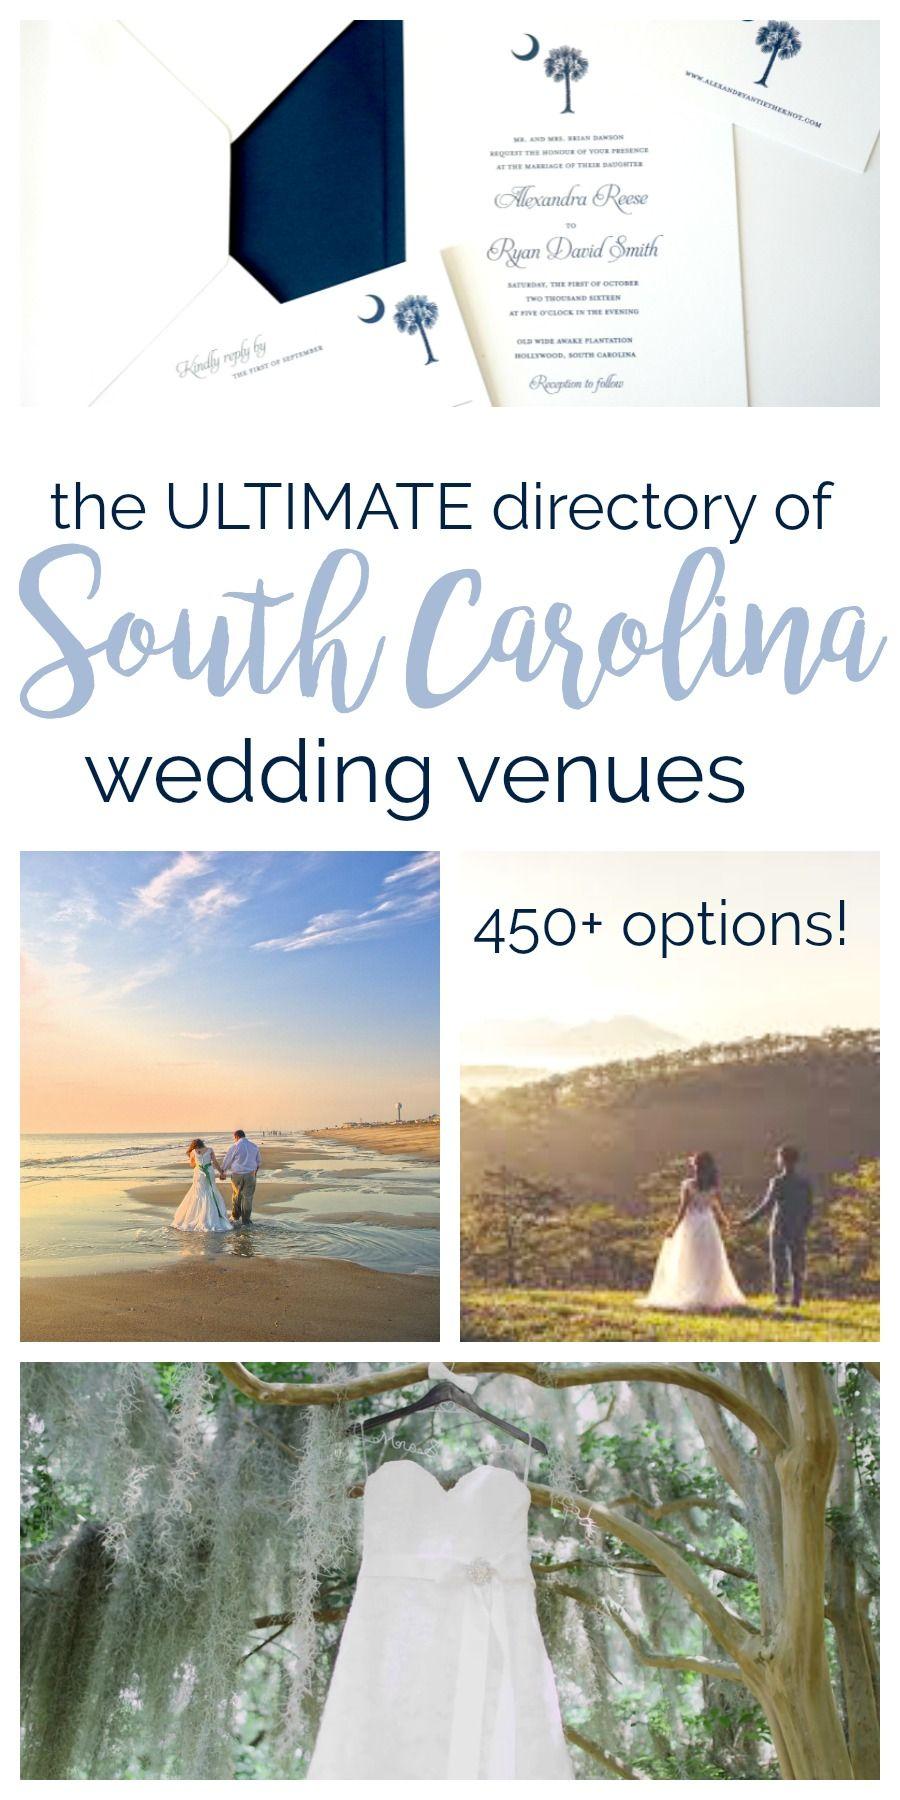 South Carolina Wedding Venues